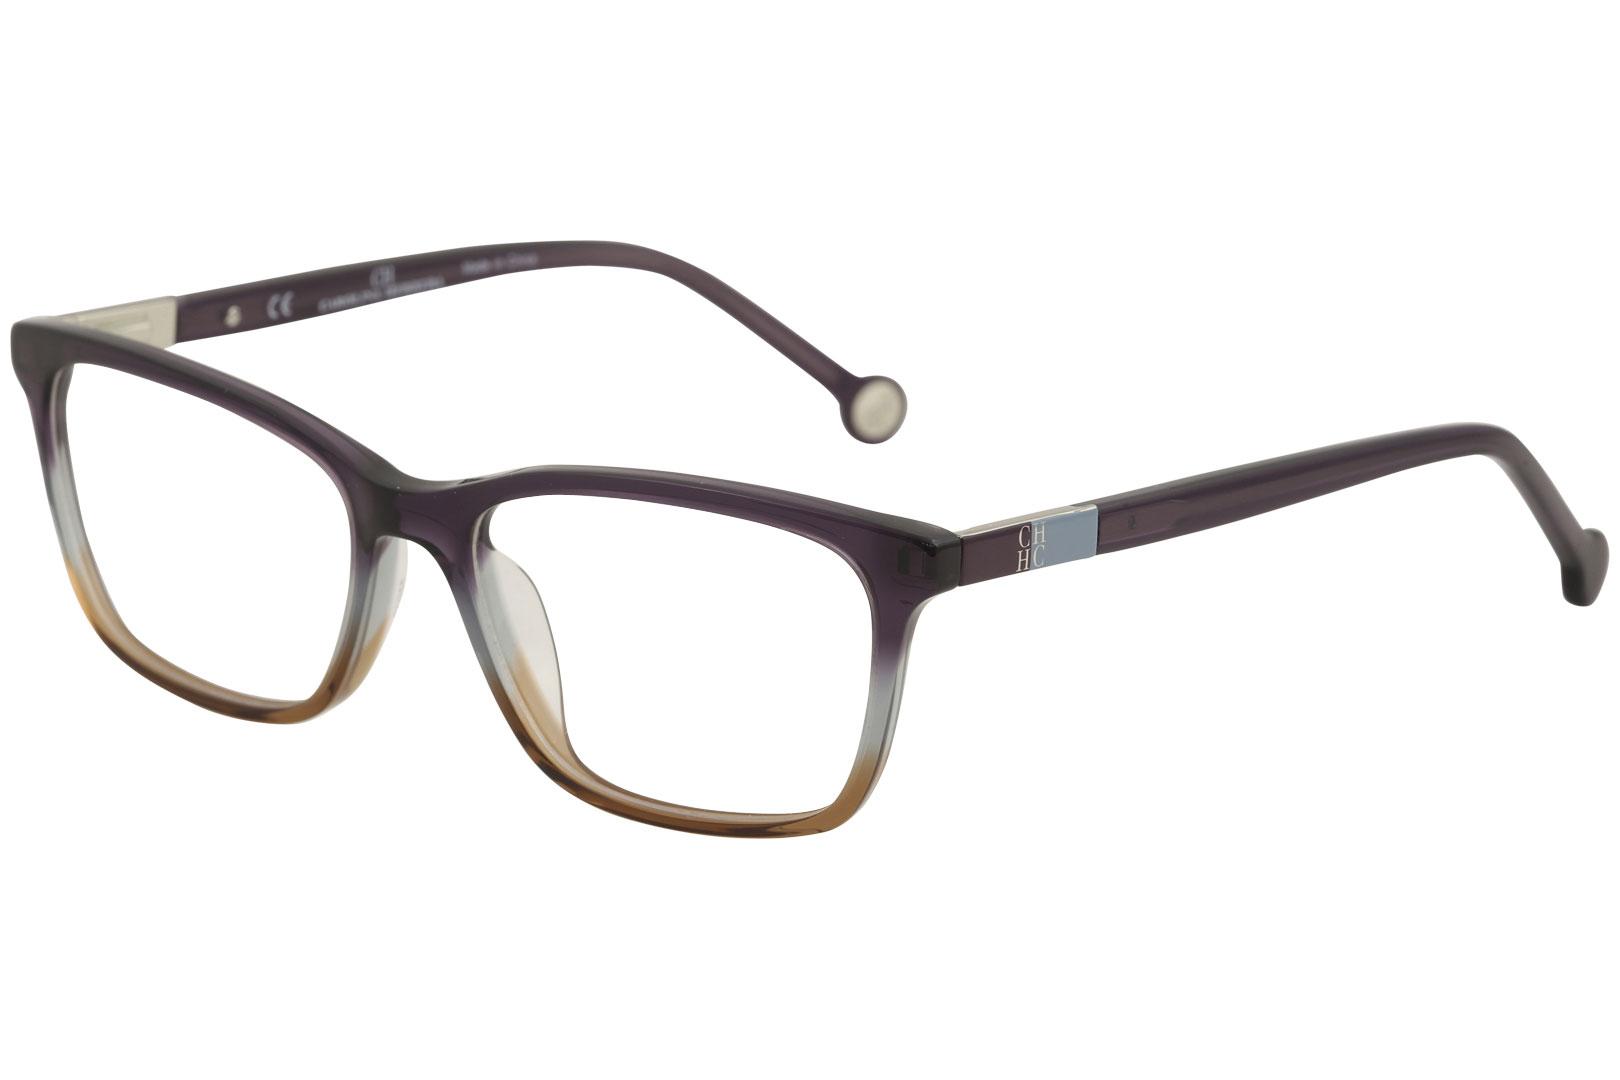 a90207eabca CH Carolina Herrera Eyeglasses VHE673K VHE 673K 0D78 Purple Optical ...